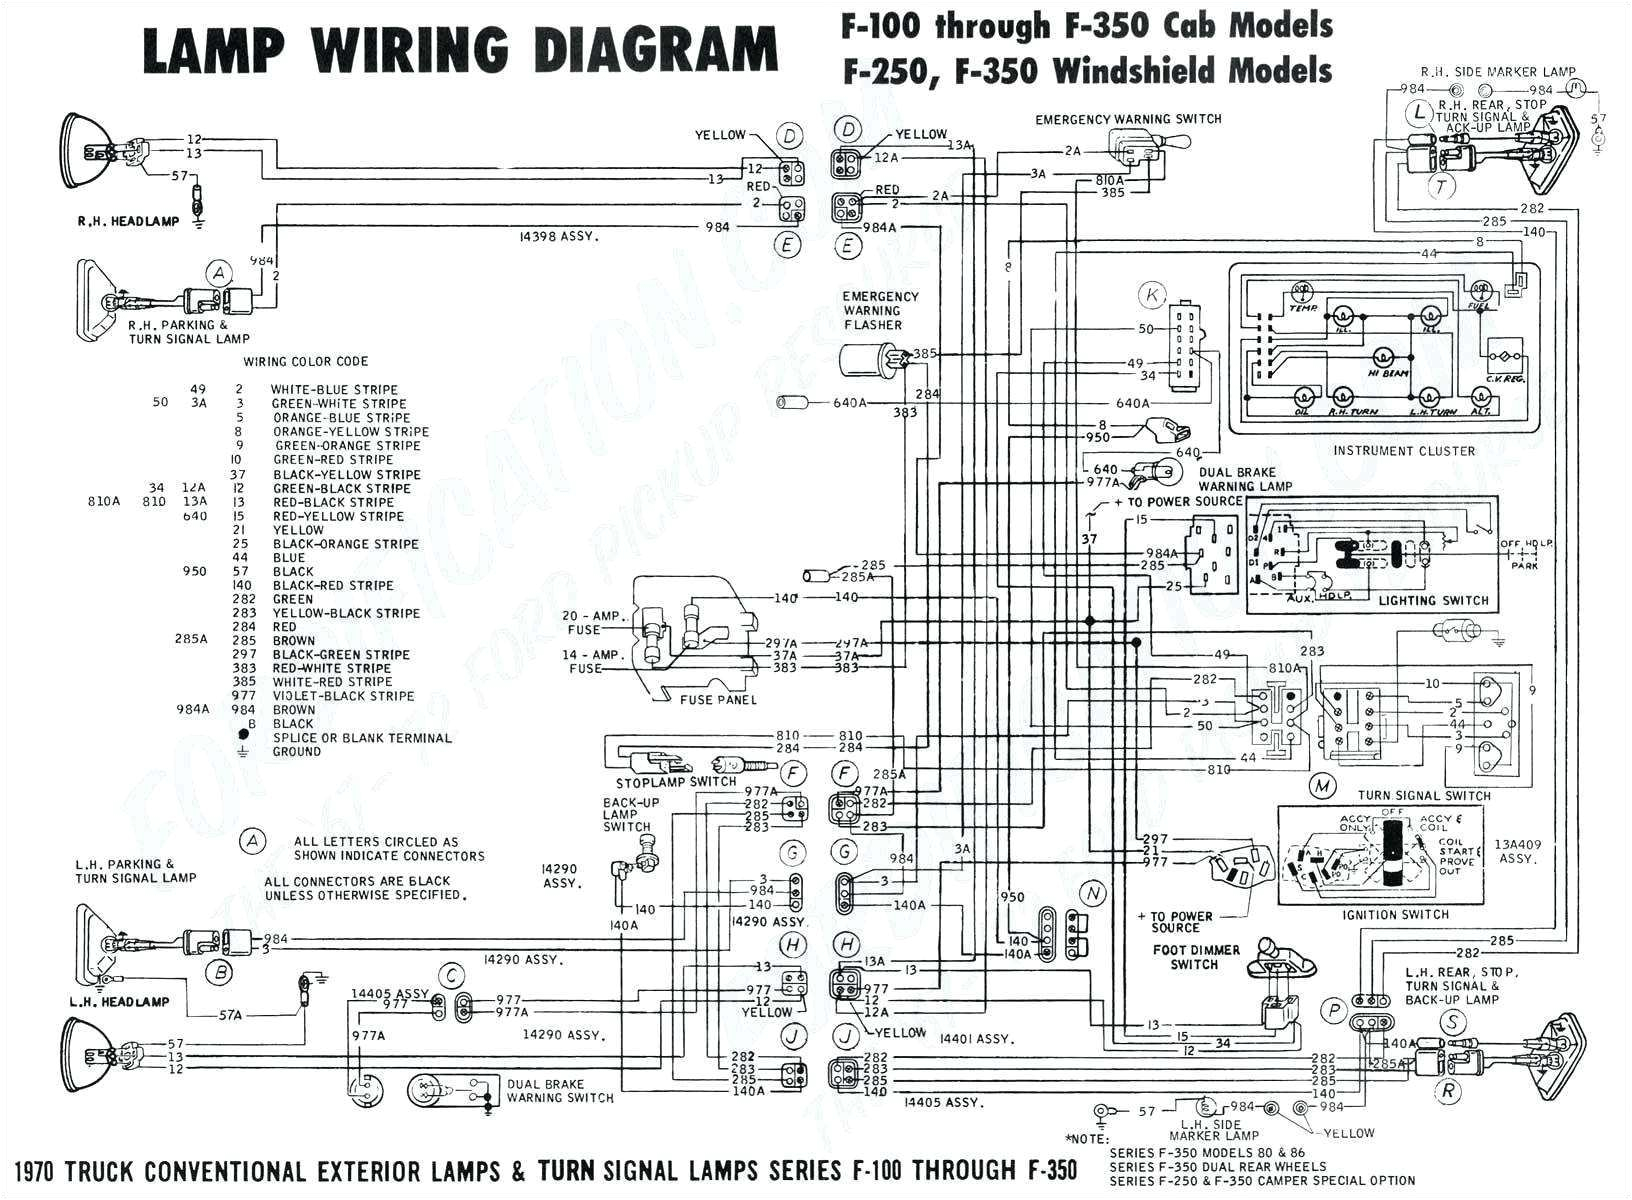 wiring diagrams online 6503 wiring diagram schematic westek 6503h wiring diagram